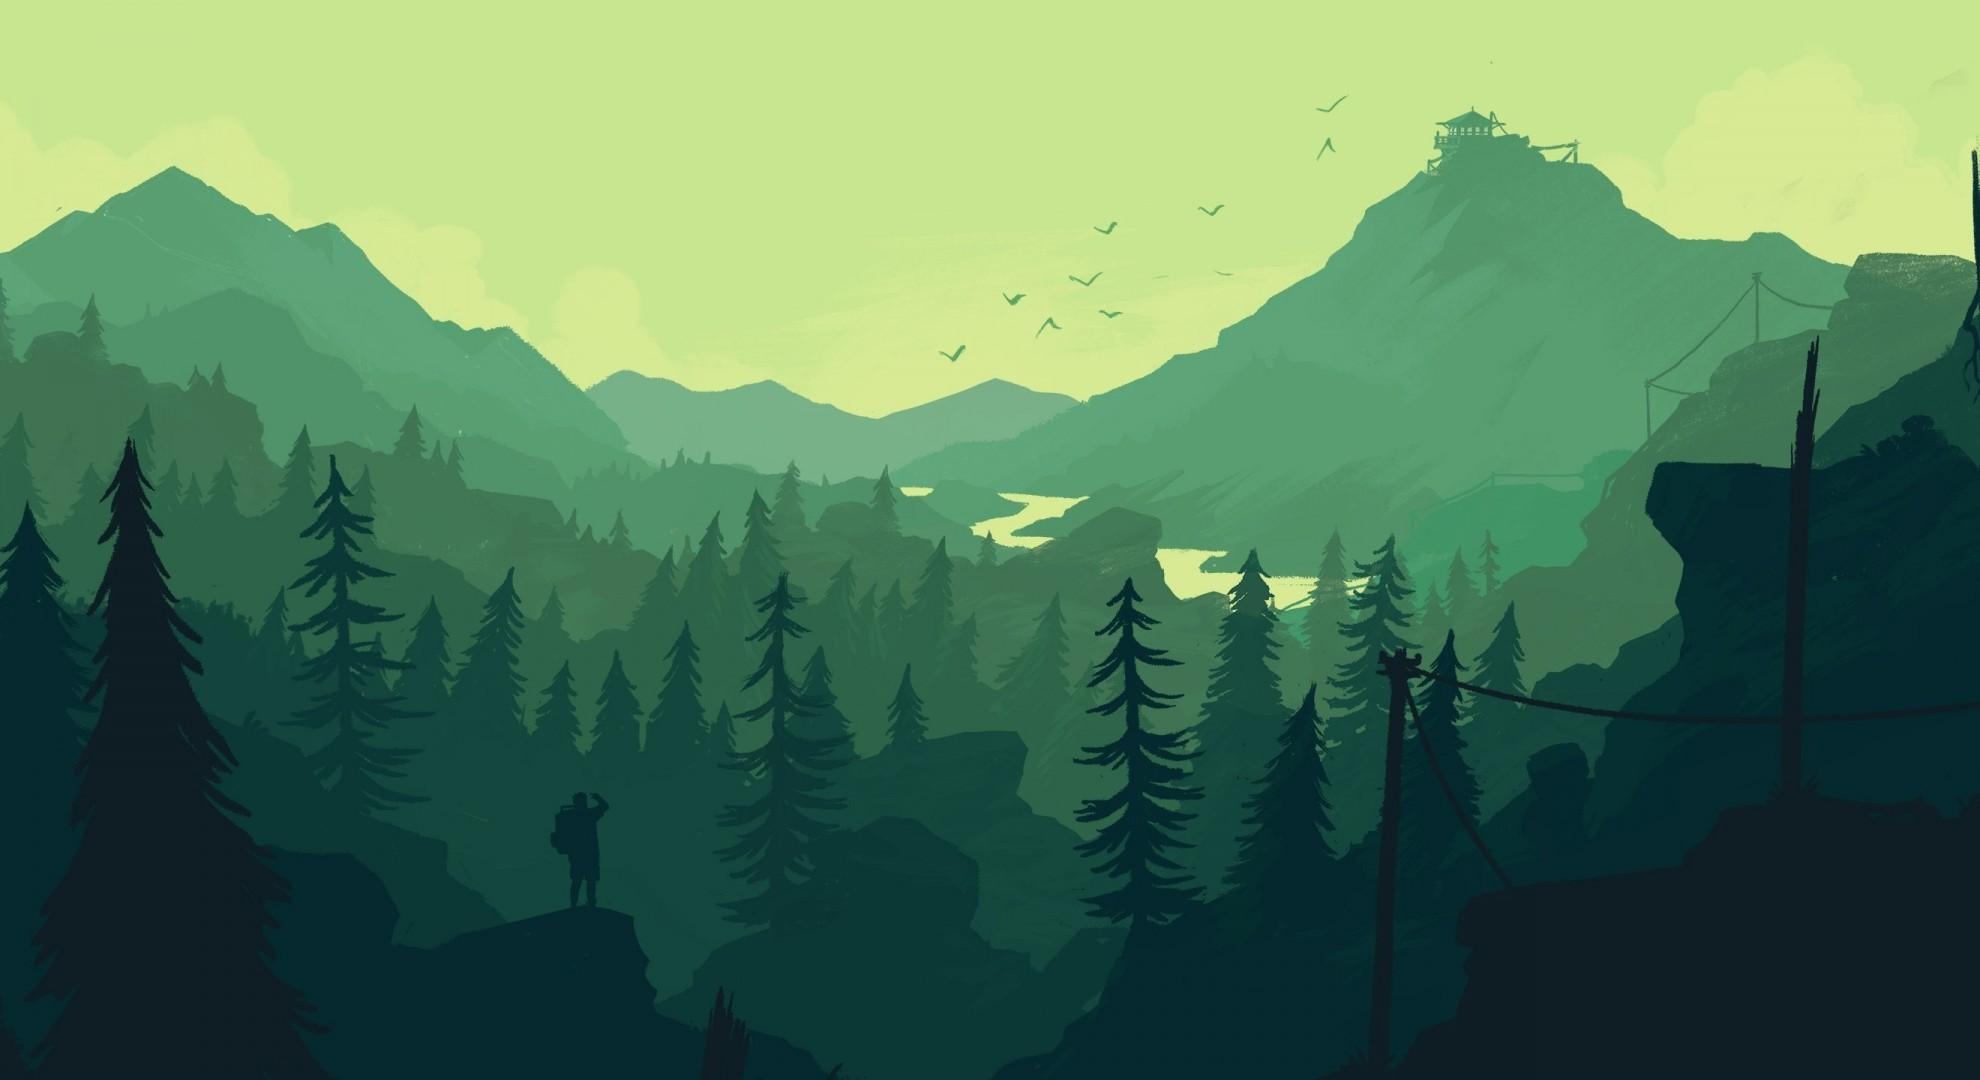 Download 1980x1080 Firewatch Landscape Forest Minimalistic 1980x1080